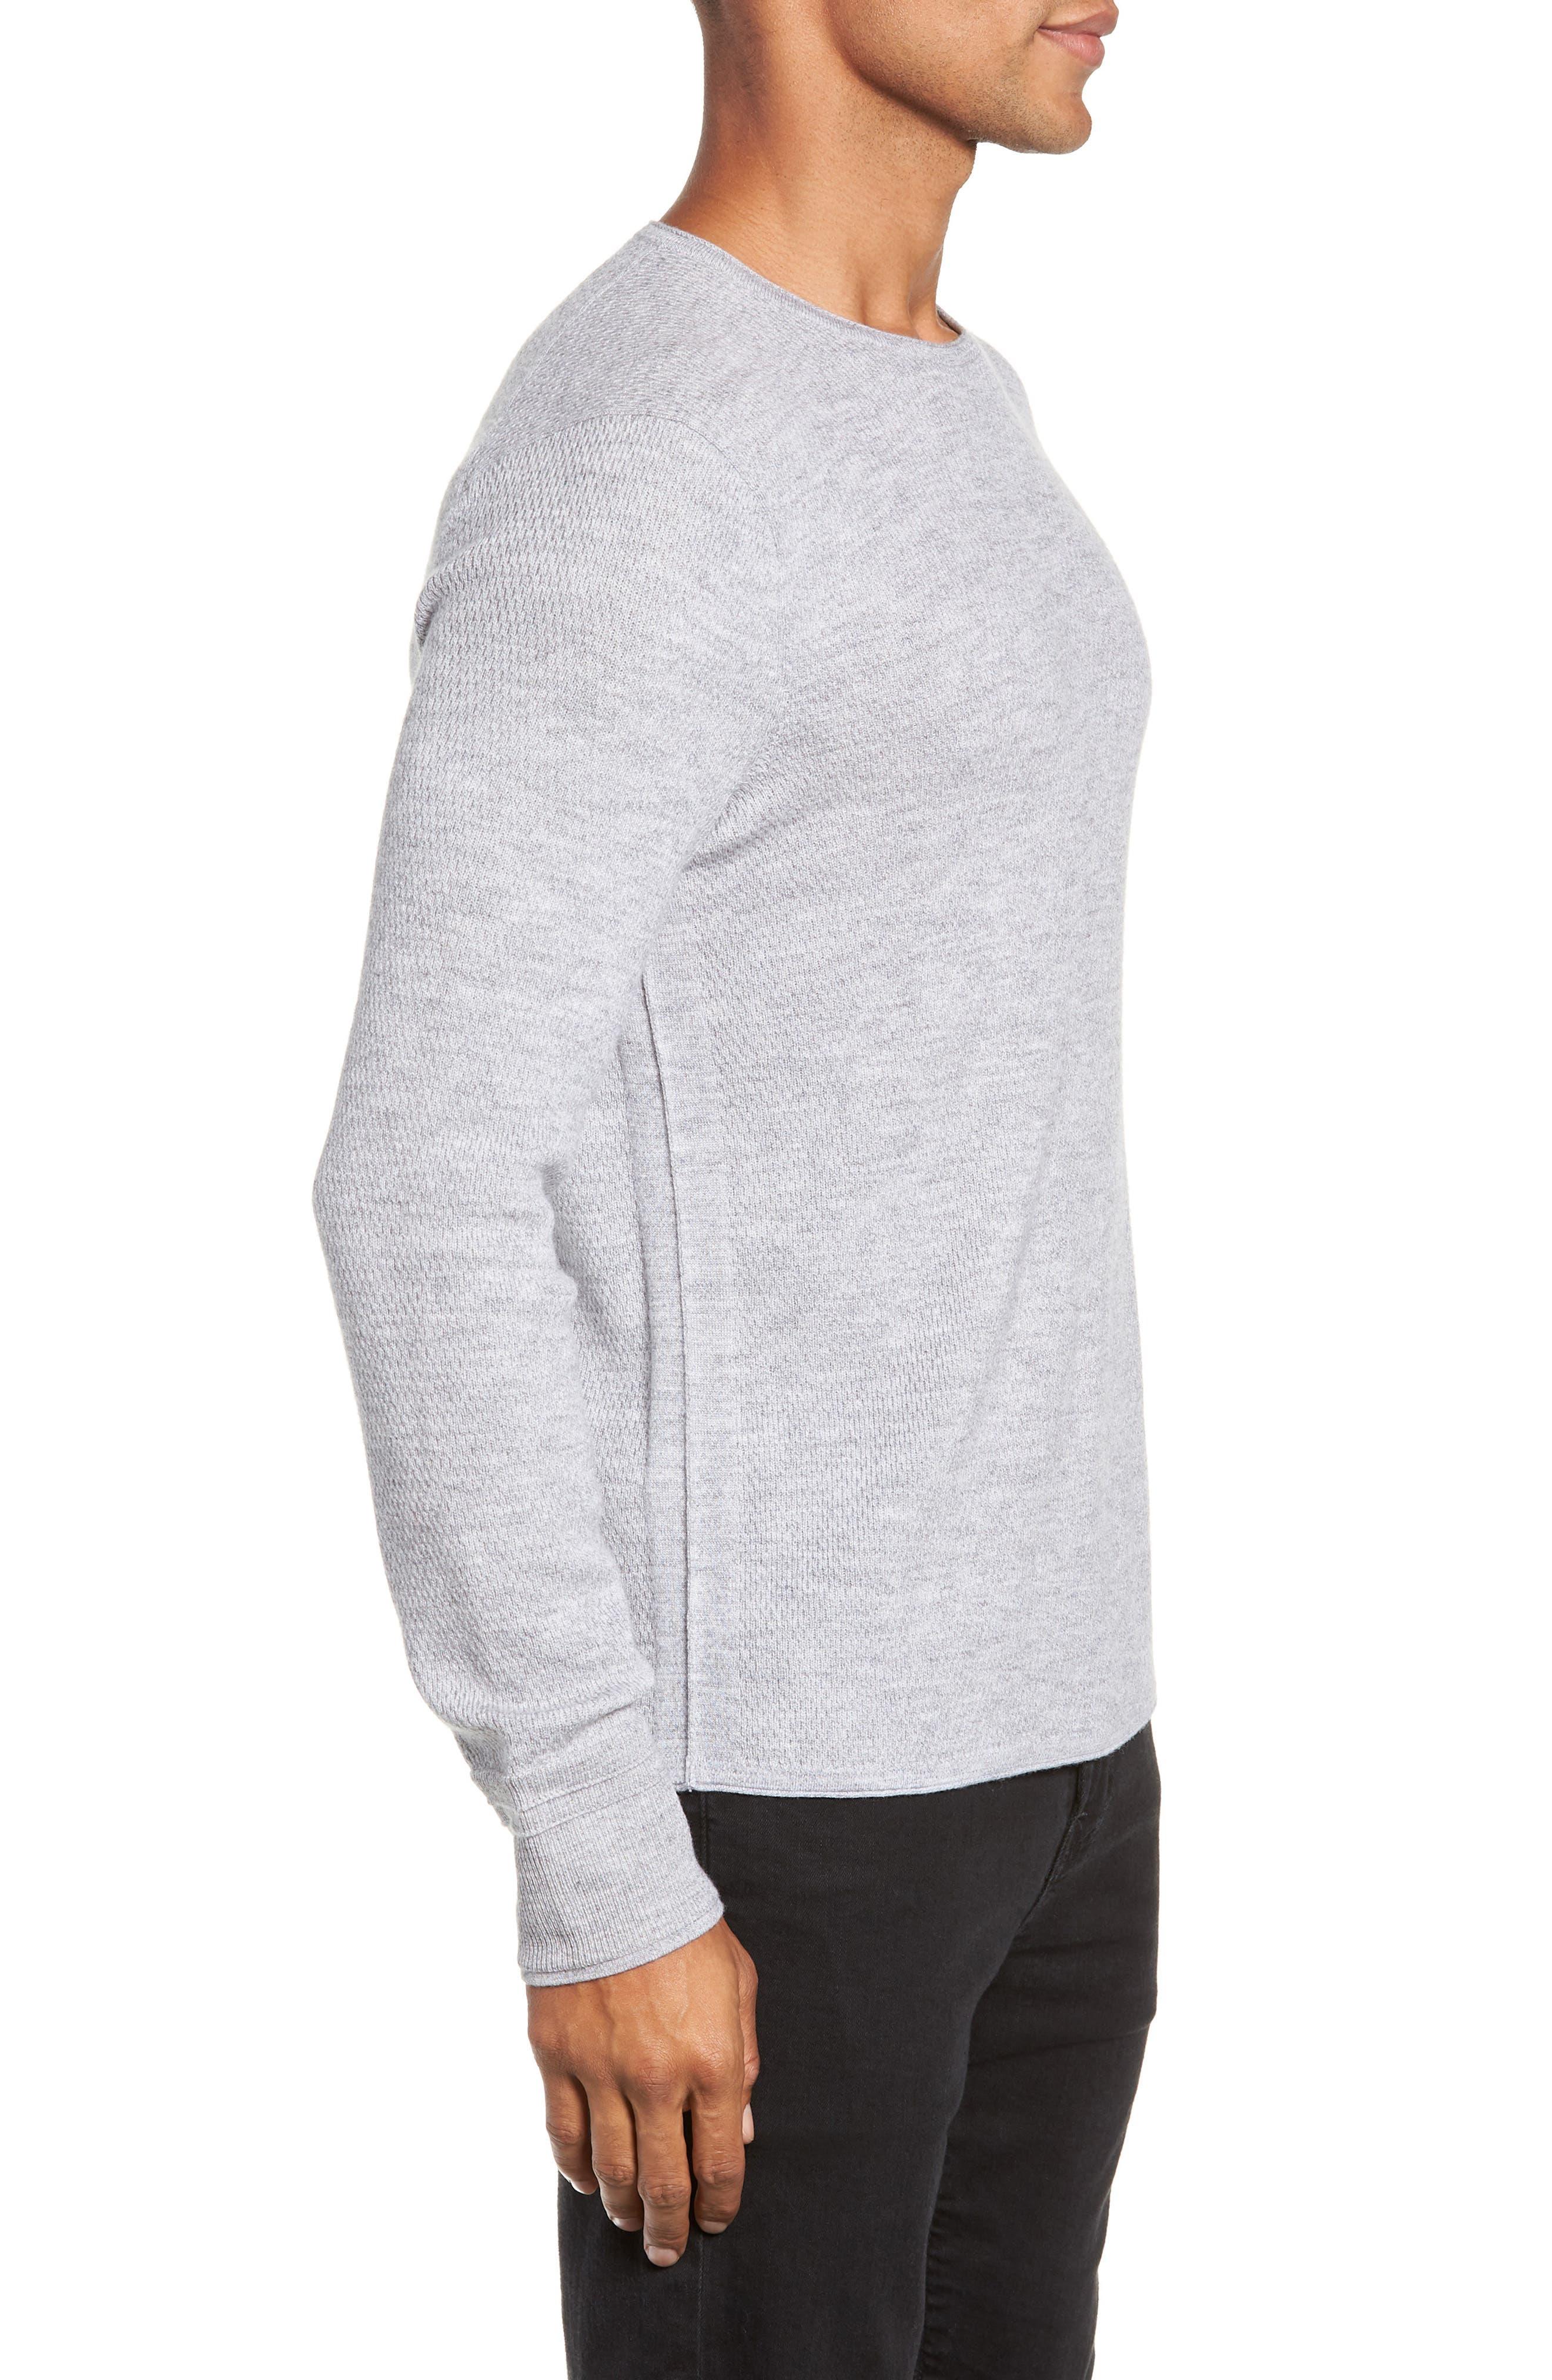 Gregory Merino Wool Blend Crewneck Sweater,                             Alternate thumbnail 3, color,                             GREY